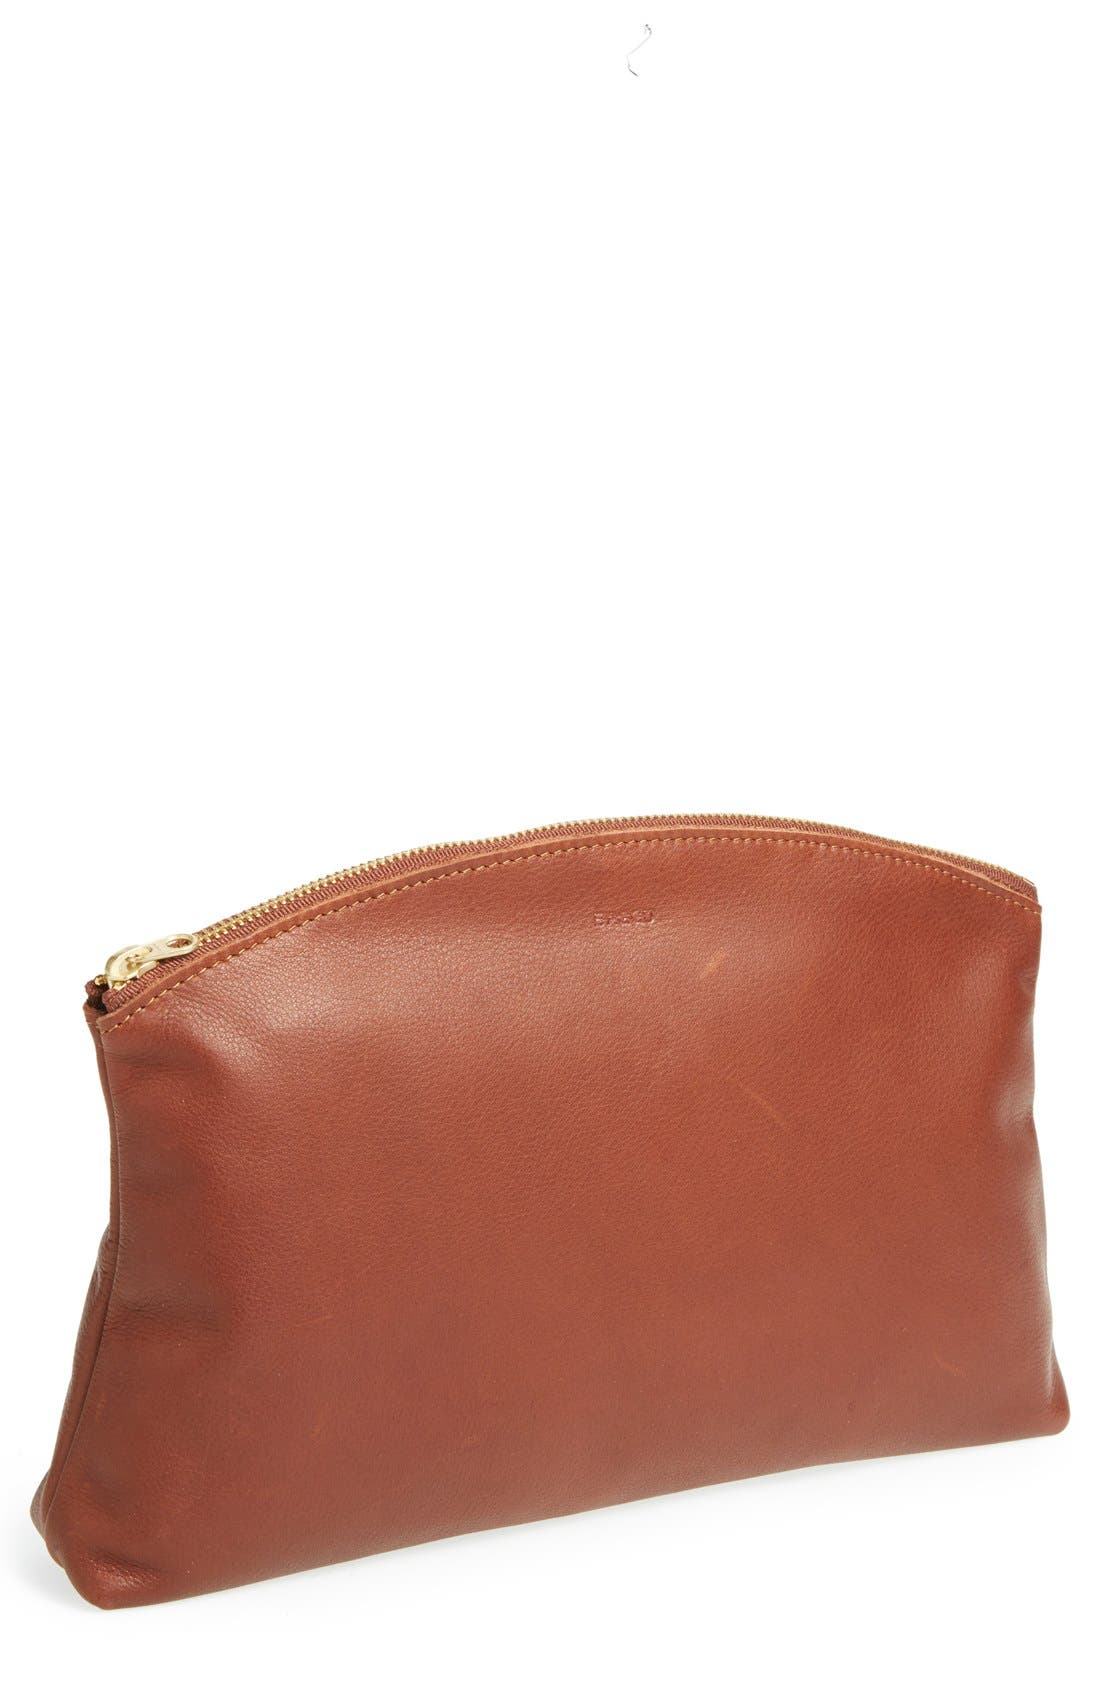 Alternate Image 1 Selected - Baggu® Leather Clutch